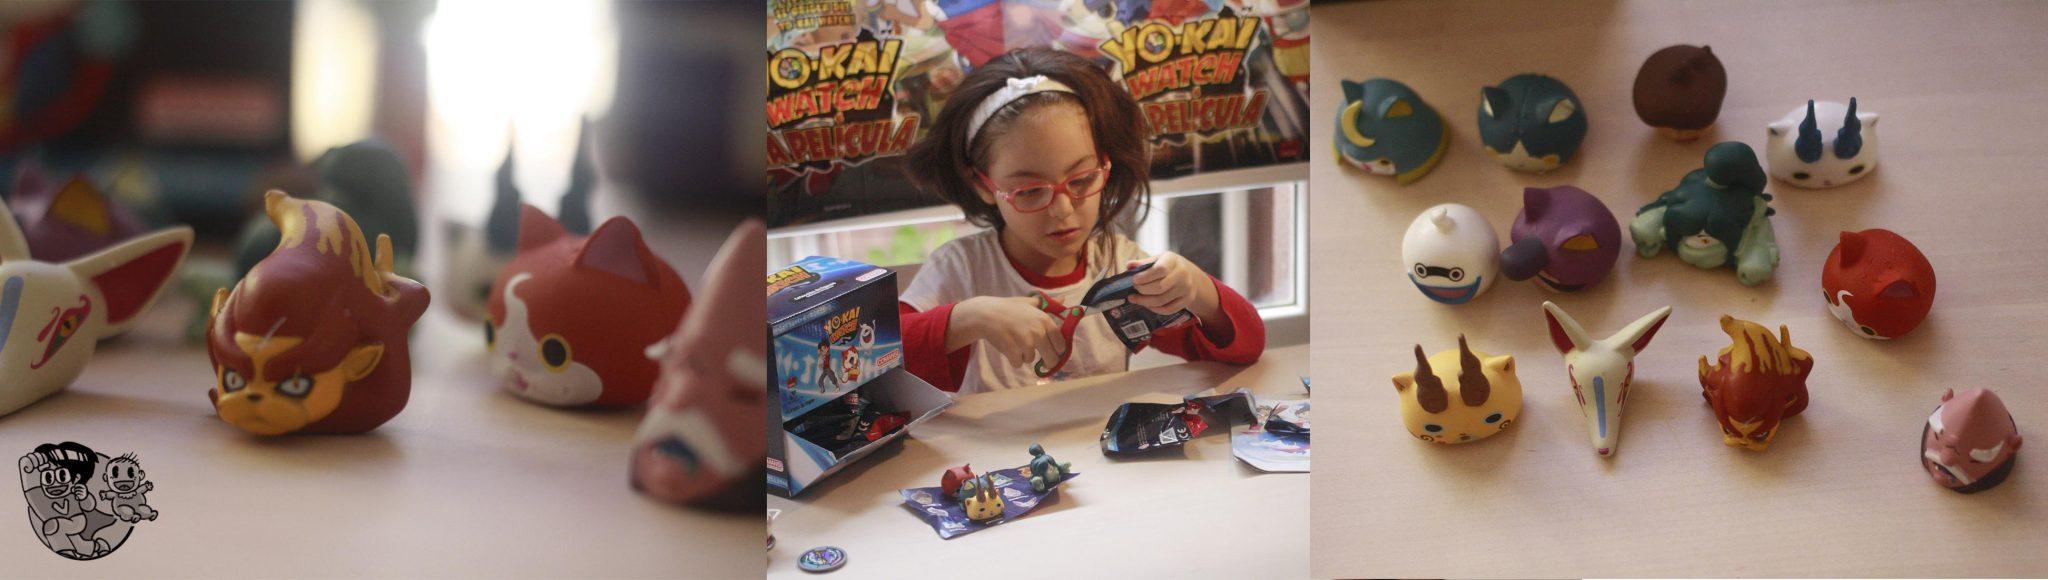 Yokai juguetes cabezones